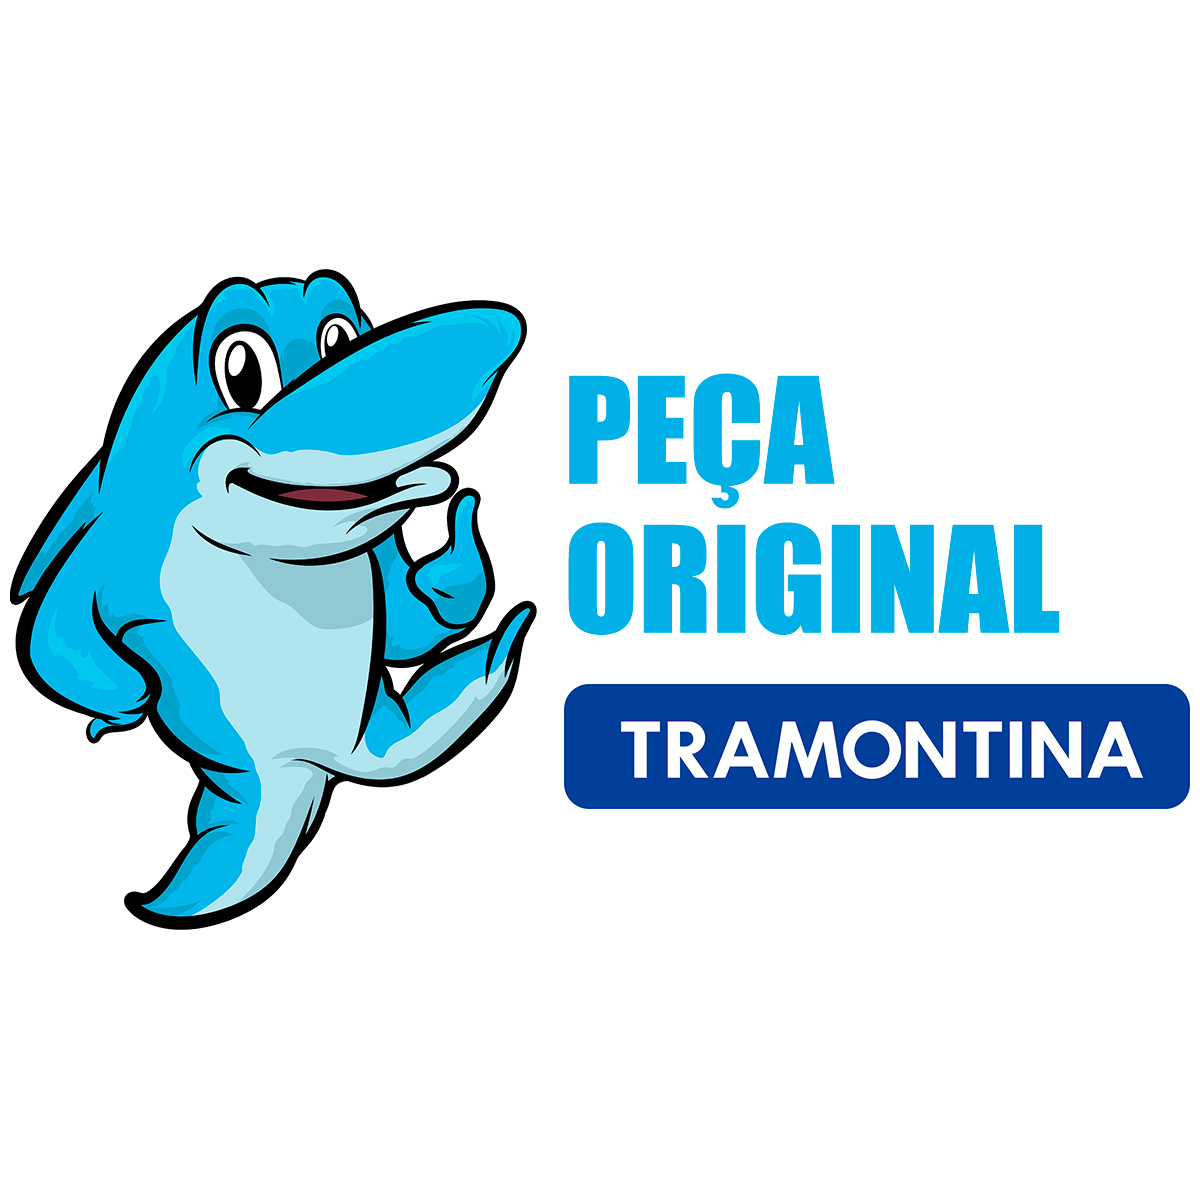 Válvula de retorno para Lavadora Tramontina 1500psi 1200w, 1600psi 1400w, 1900psi 1800w Original